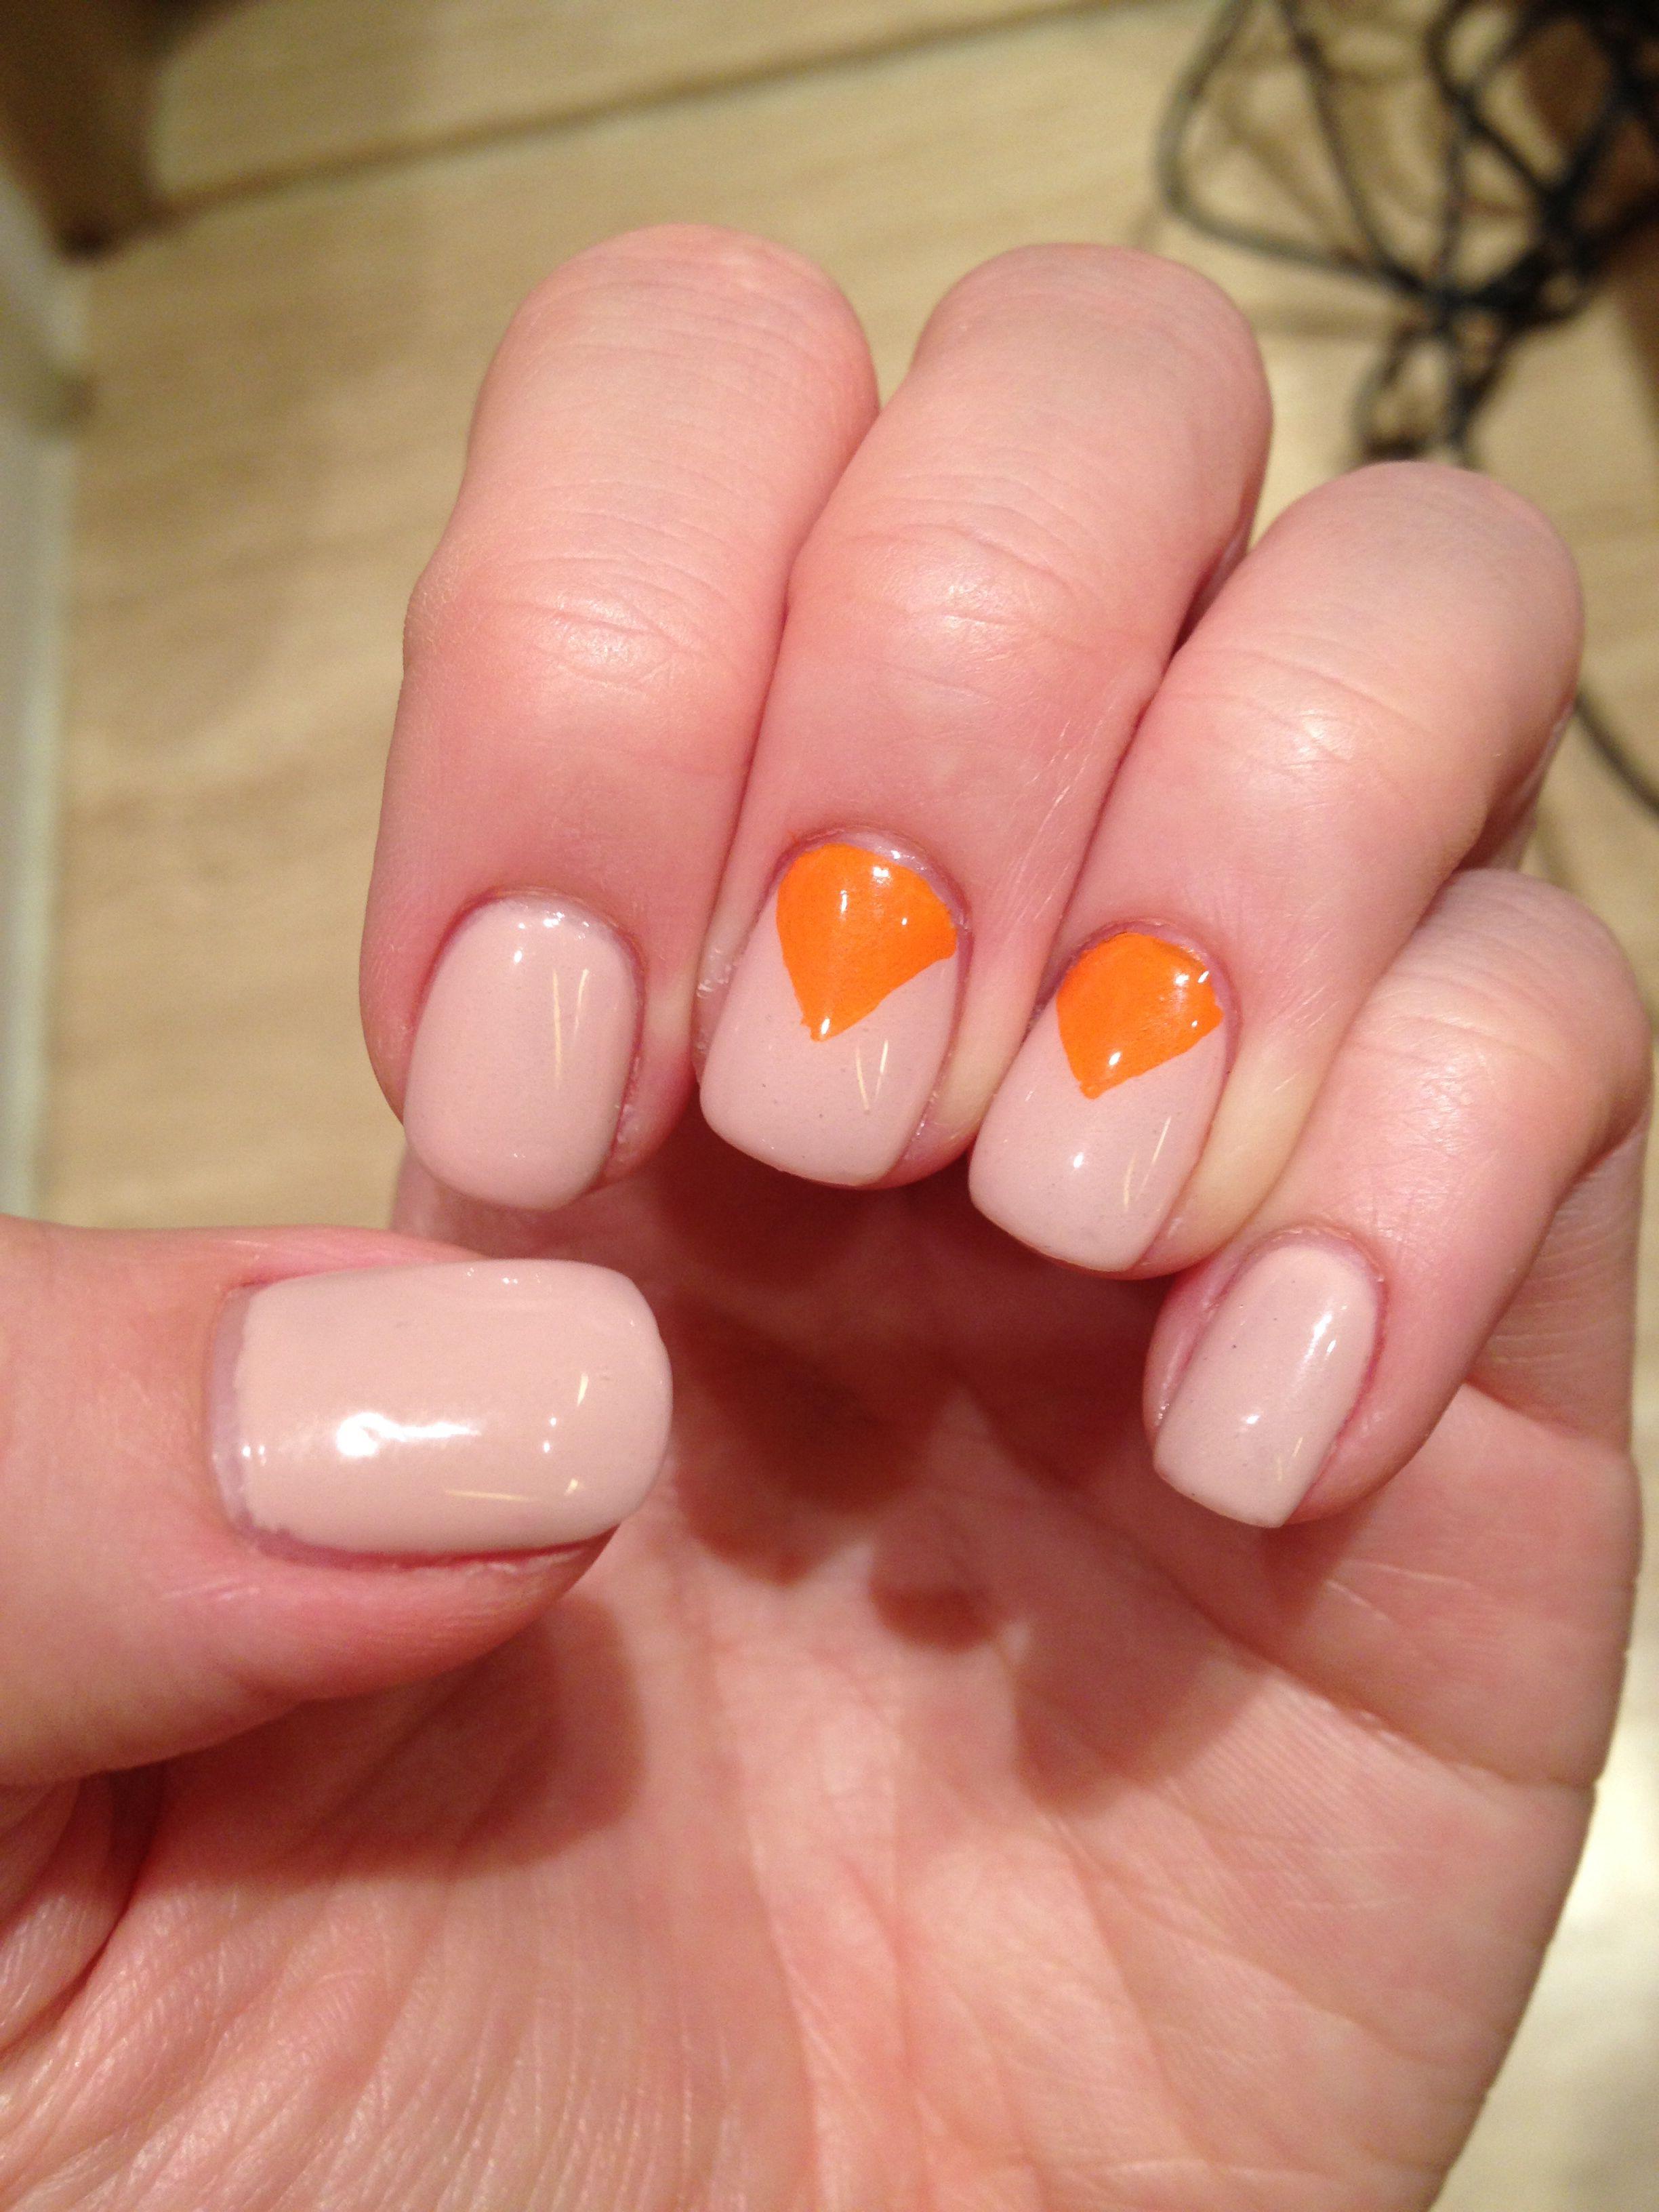 Pin by Audra Peng on Nails   Nails, Beauty